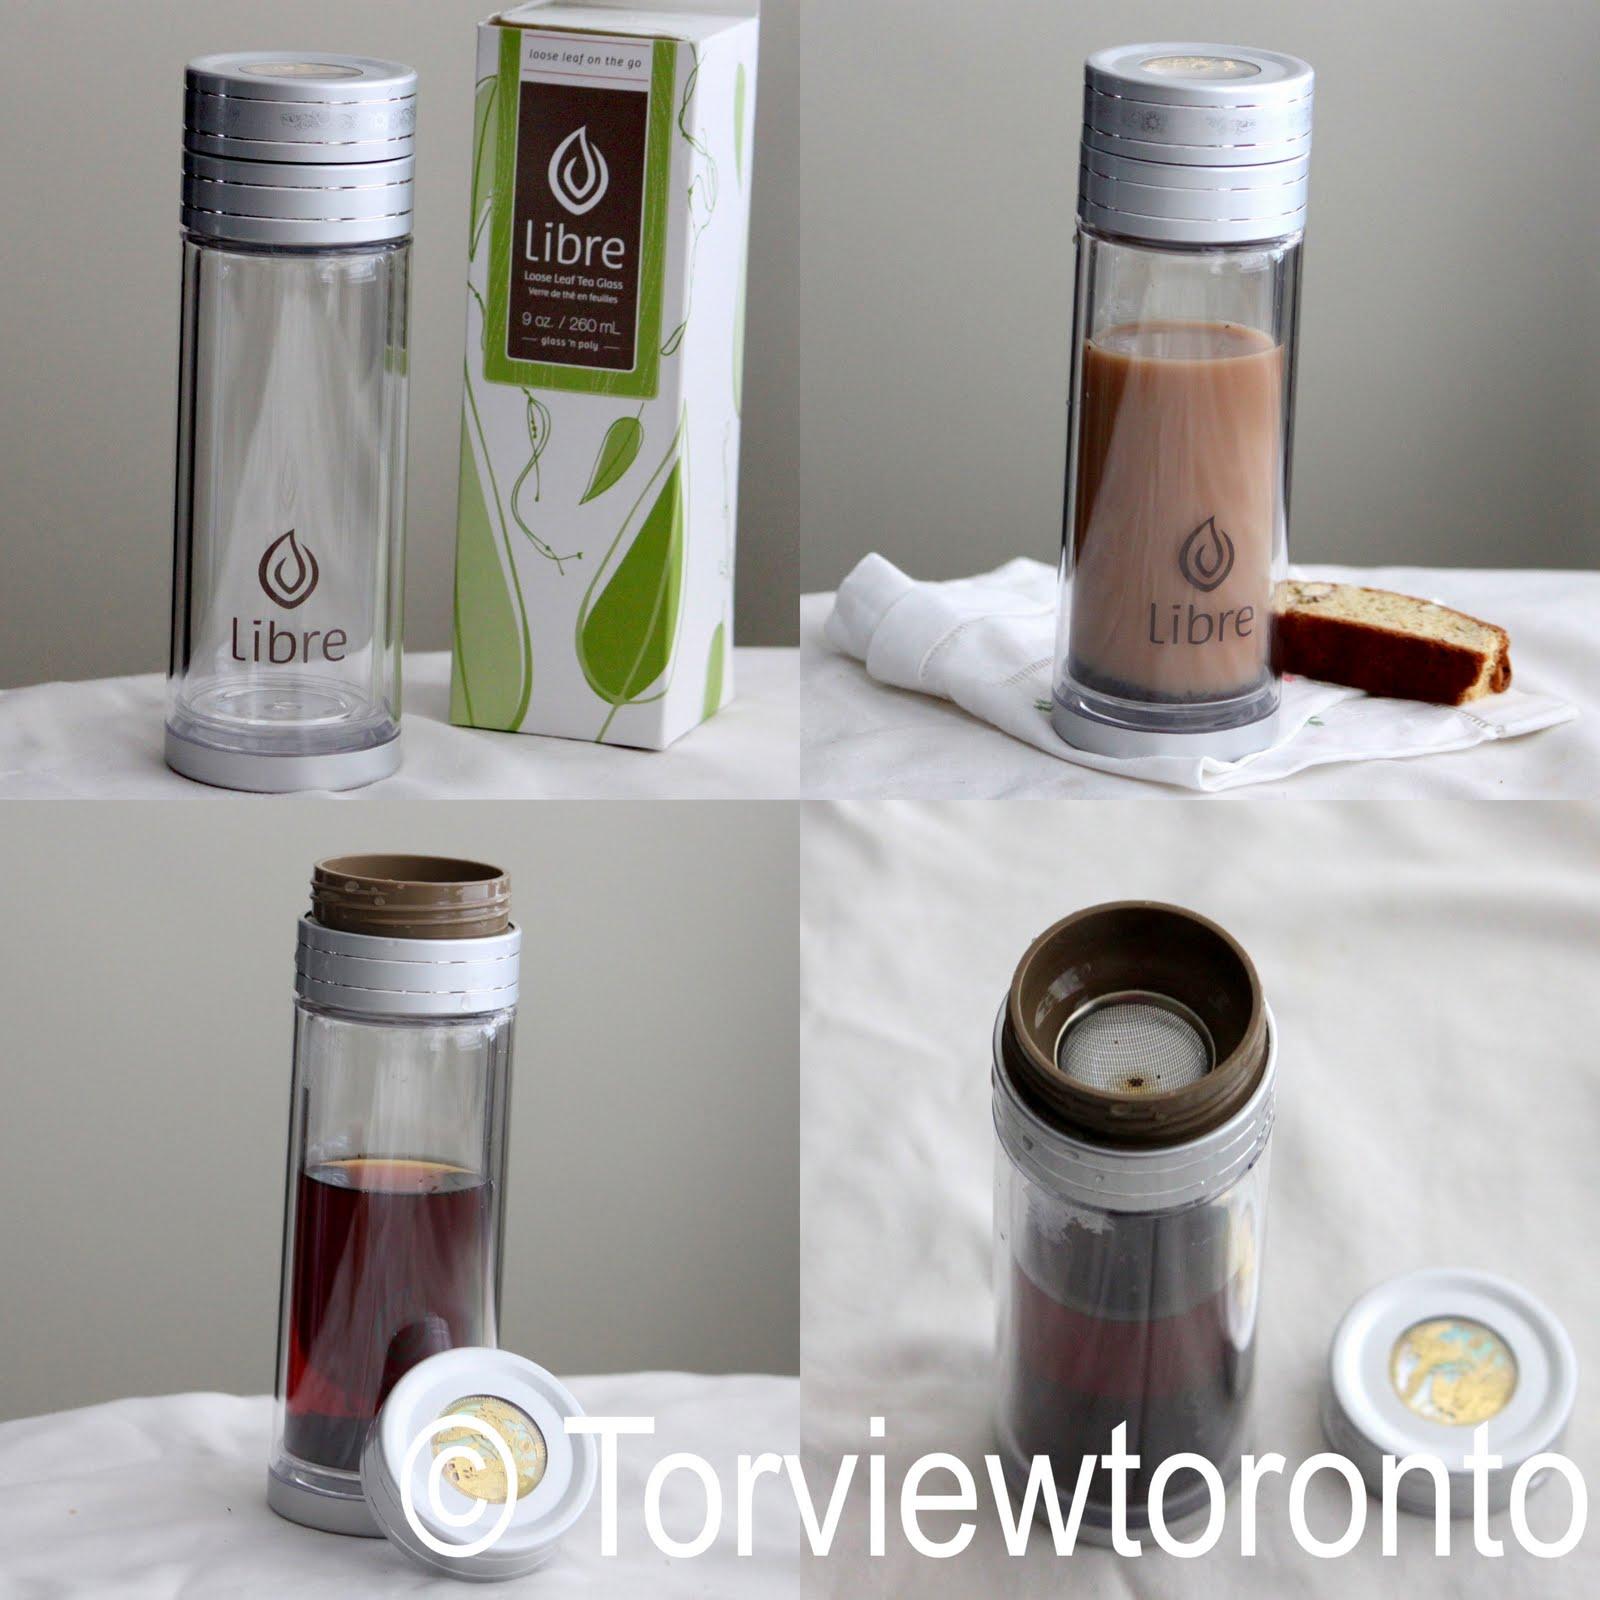 Torviewtoronto Libre Glass N Poly Tea Review And Event